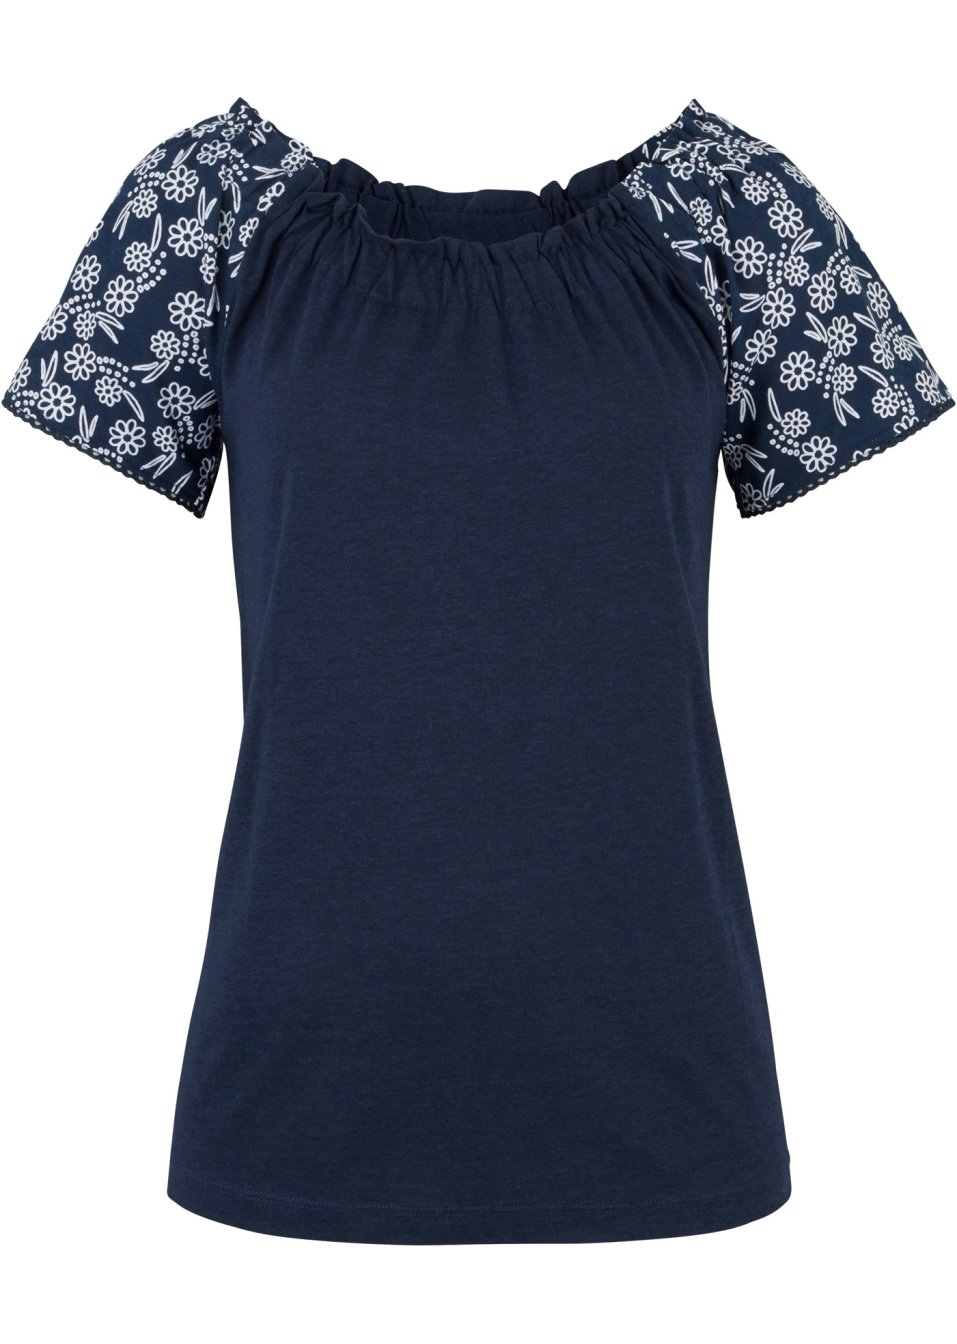 Carmenshirt bedruckt dunkelblau - Damen - bonprix.de Sla9a dxcYJ